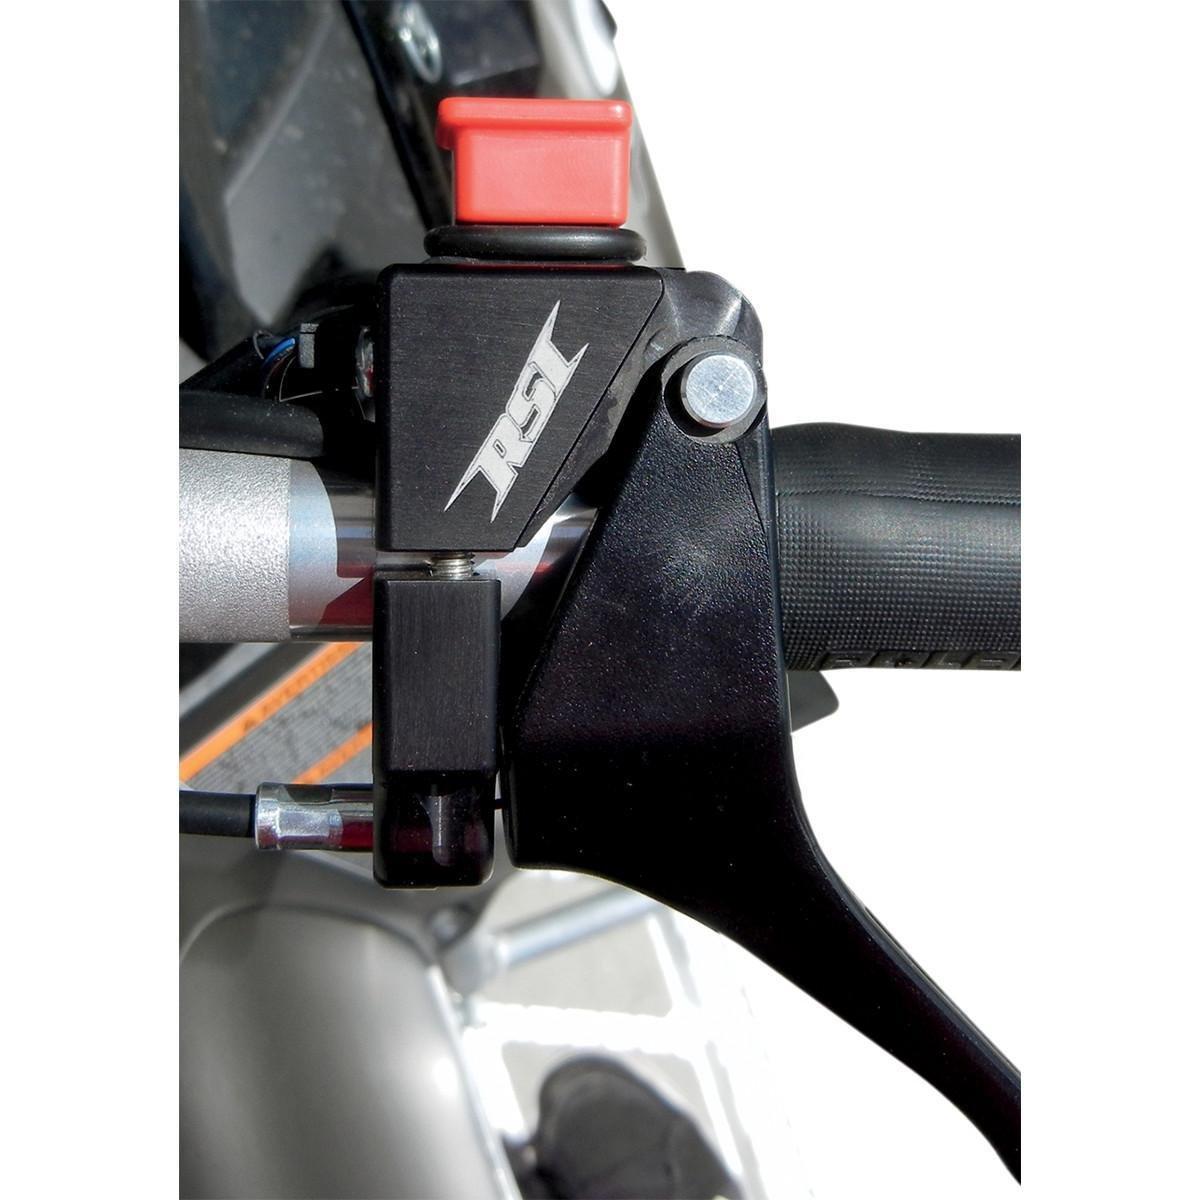 RSI Racing TB-4-C Throttle Block Kit with Waterproof Push Button Kill Switch